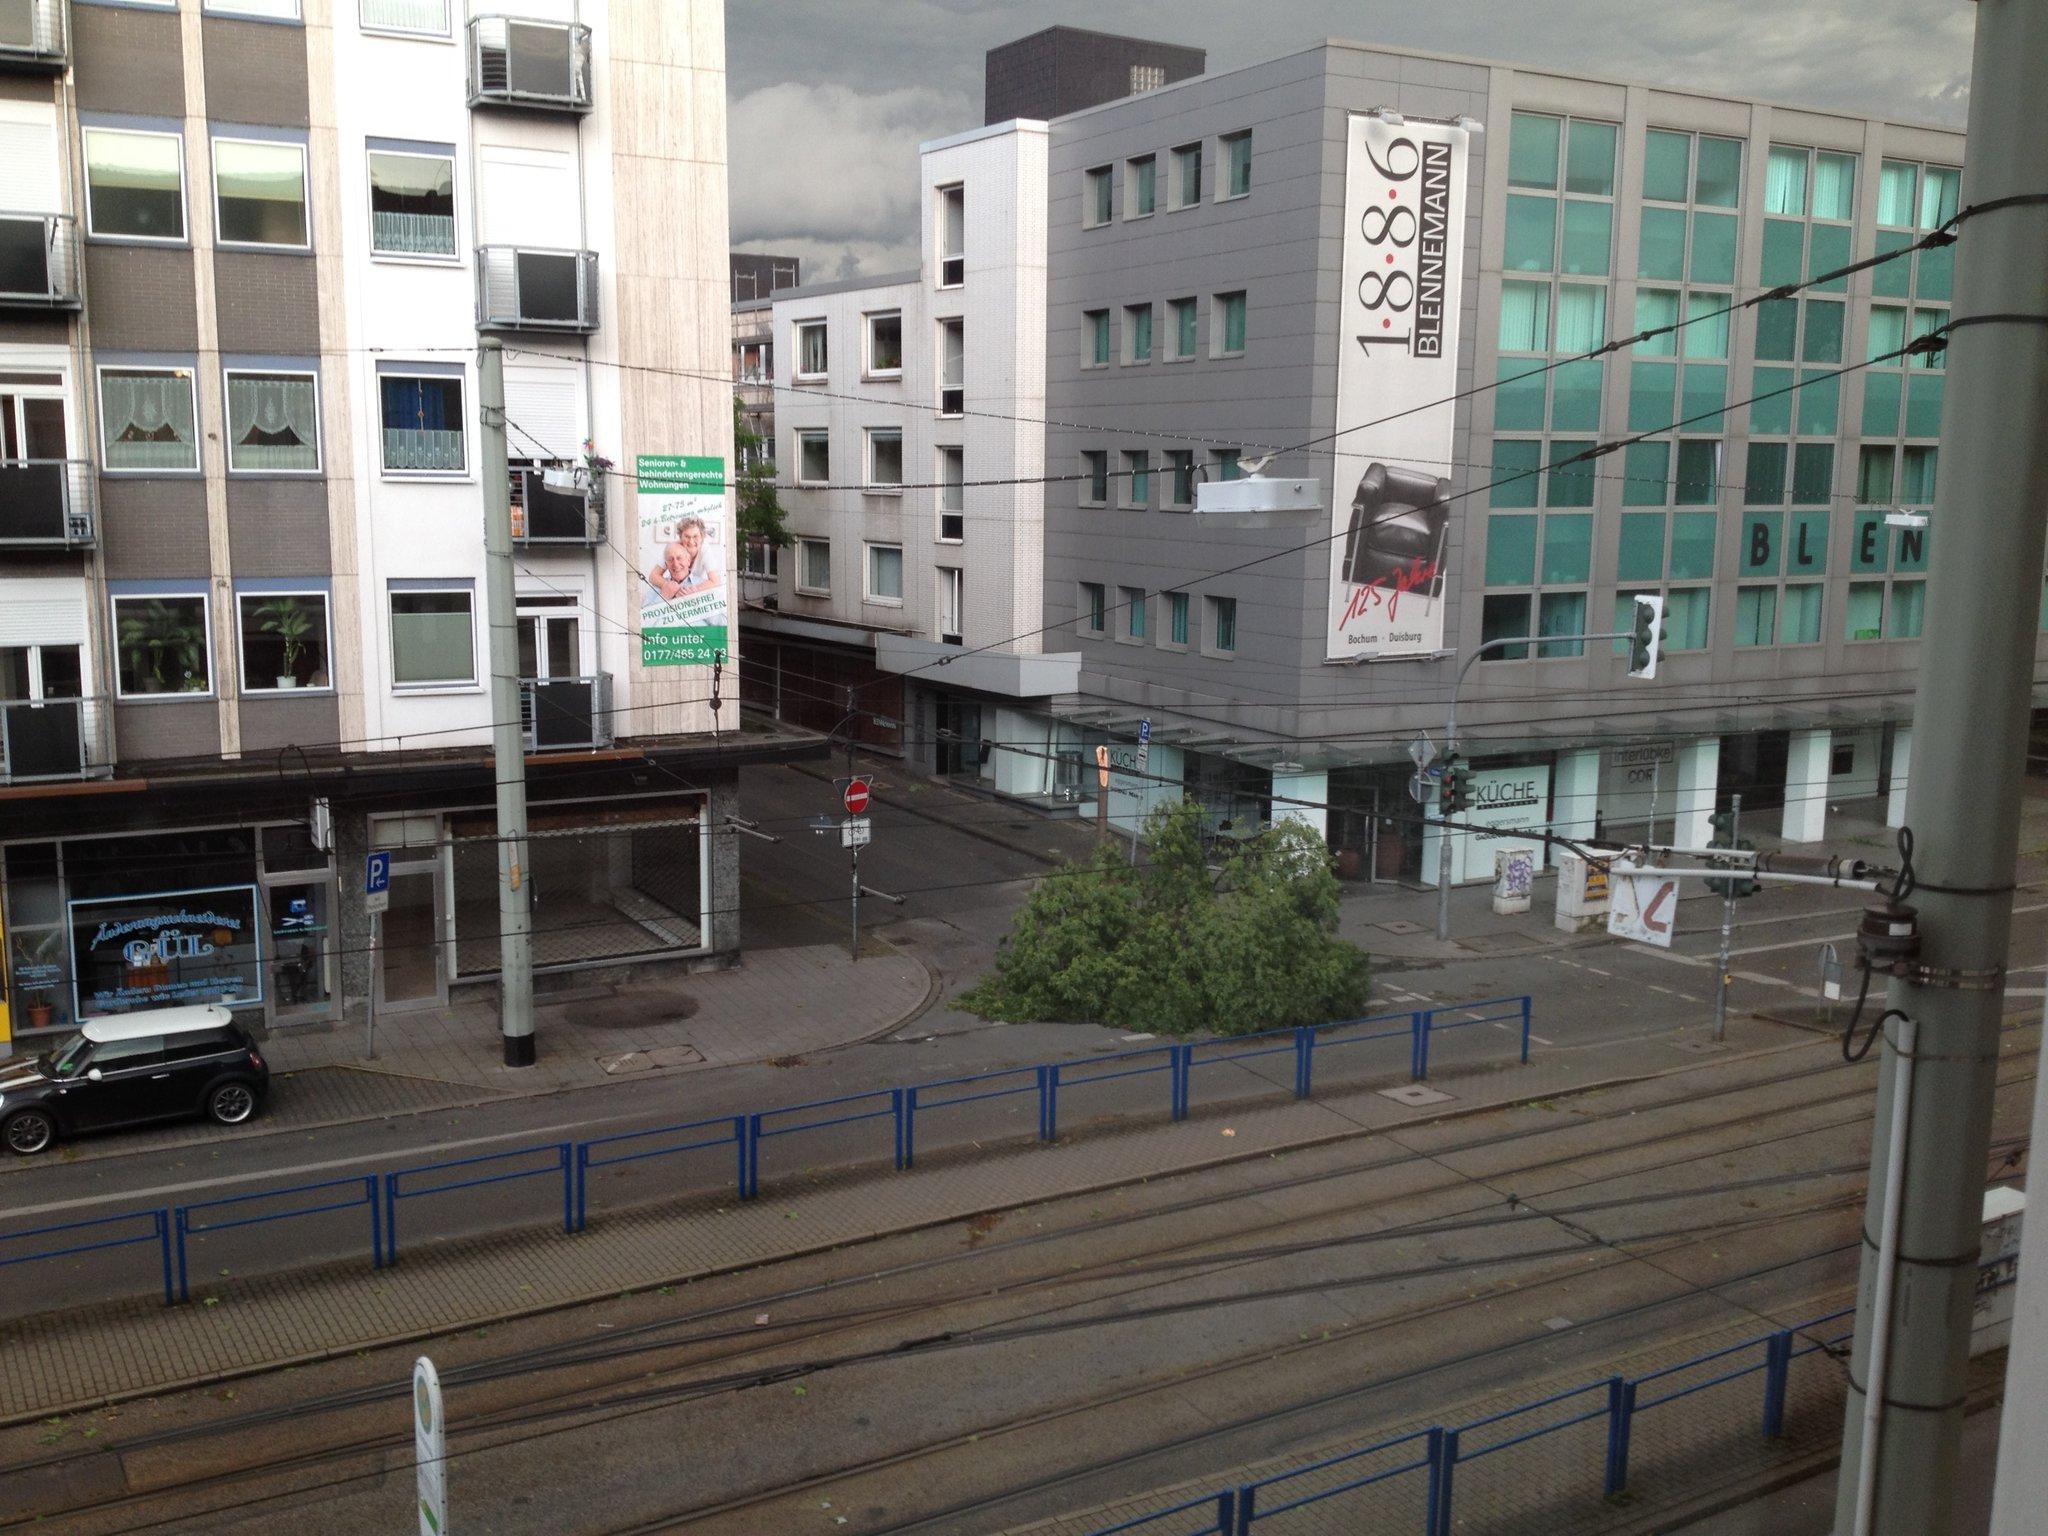 Blennemann Duisburg unwetter in bochum 9.6.2014 - bochum